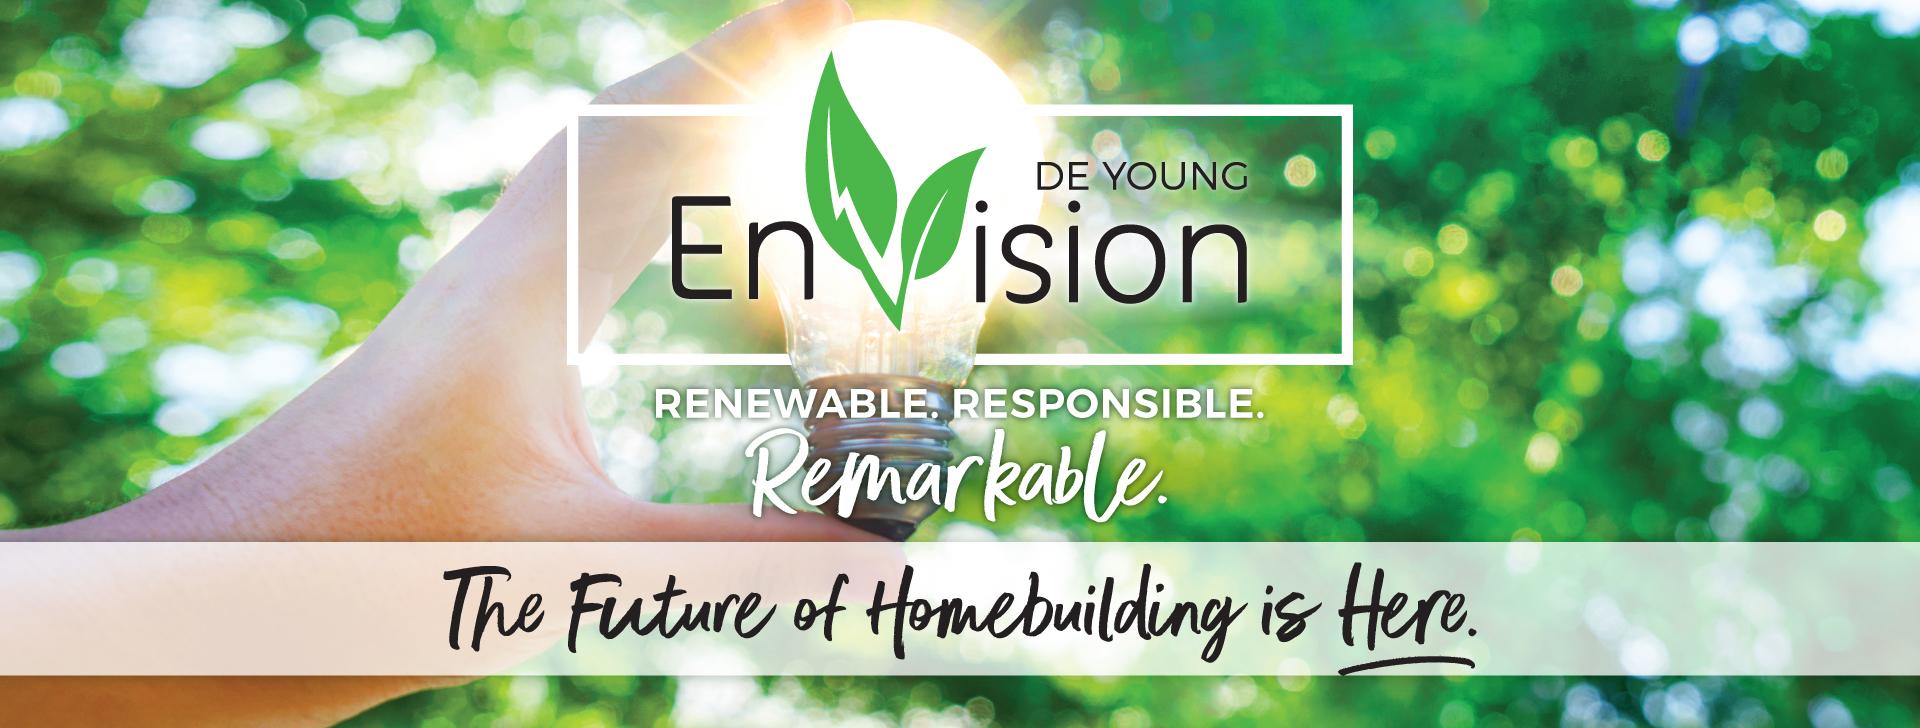 DeYoung EnVision – Renewable. Responsible. Remarkable.